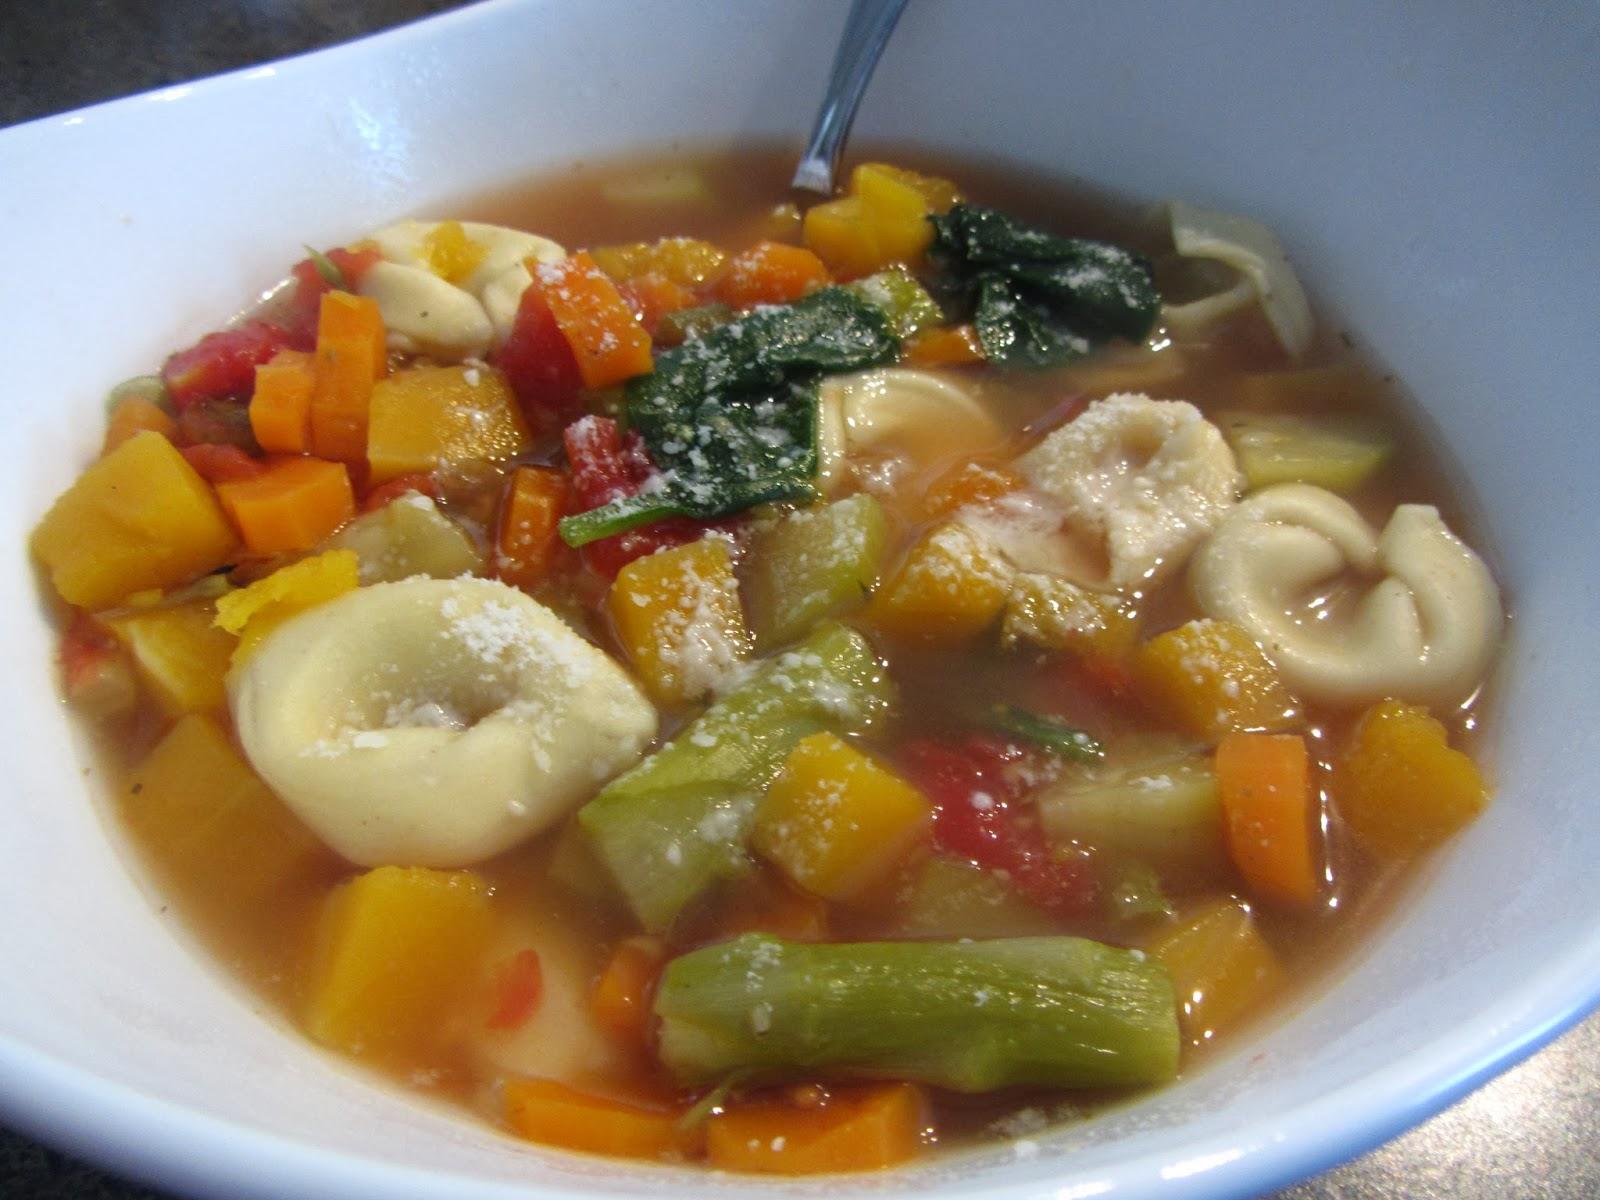 ... Master Gardener: Seven Vegetable Tortellini Soup (in a Slow Cooker